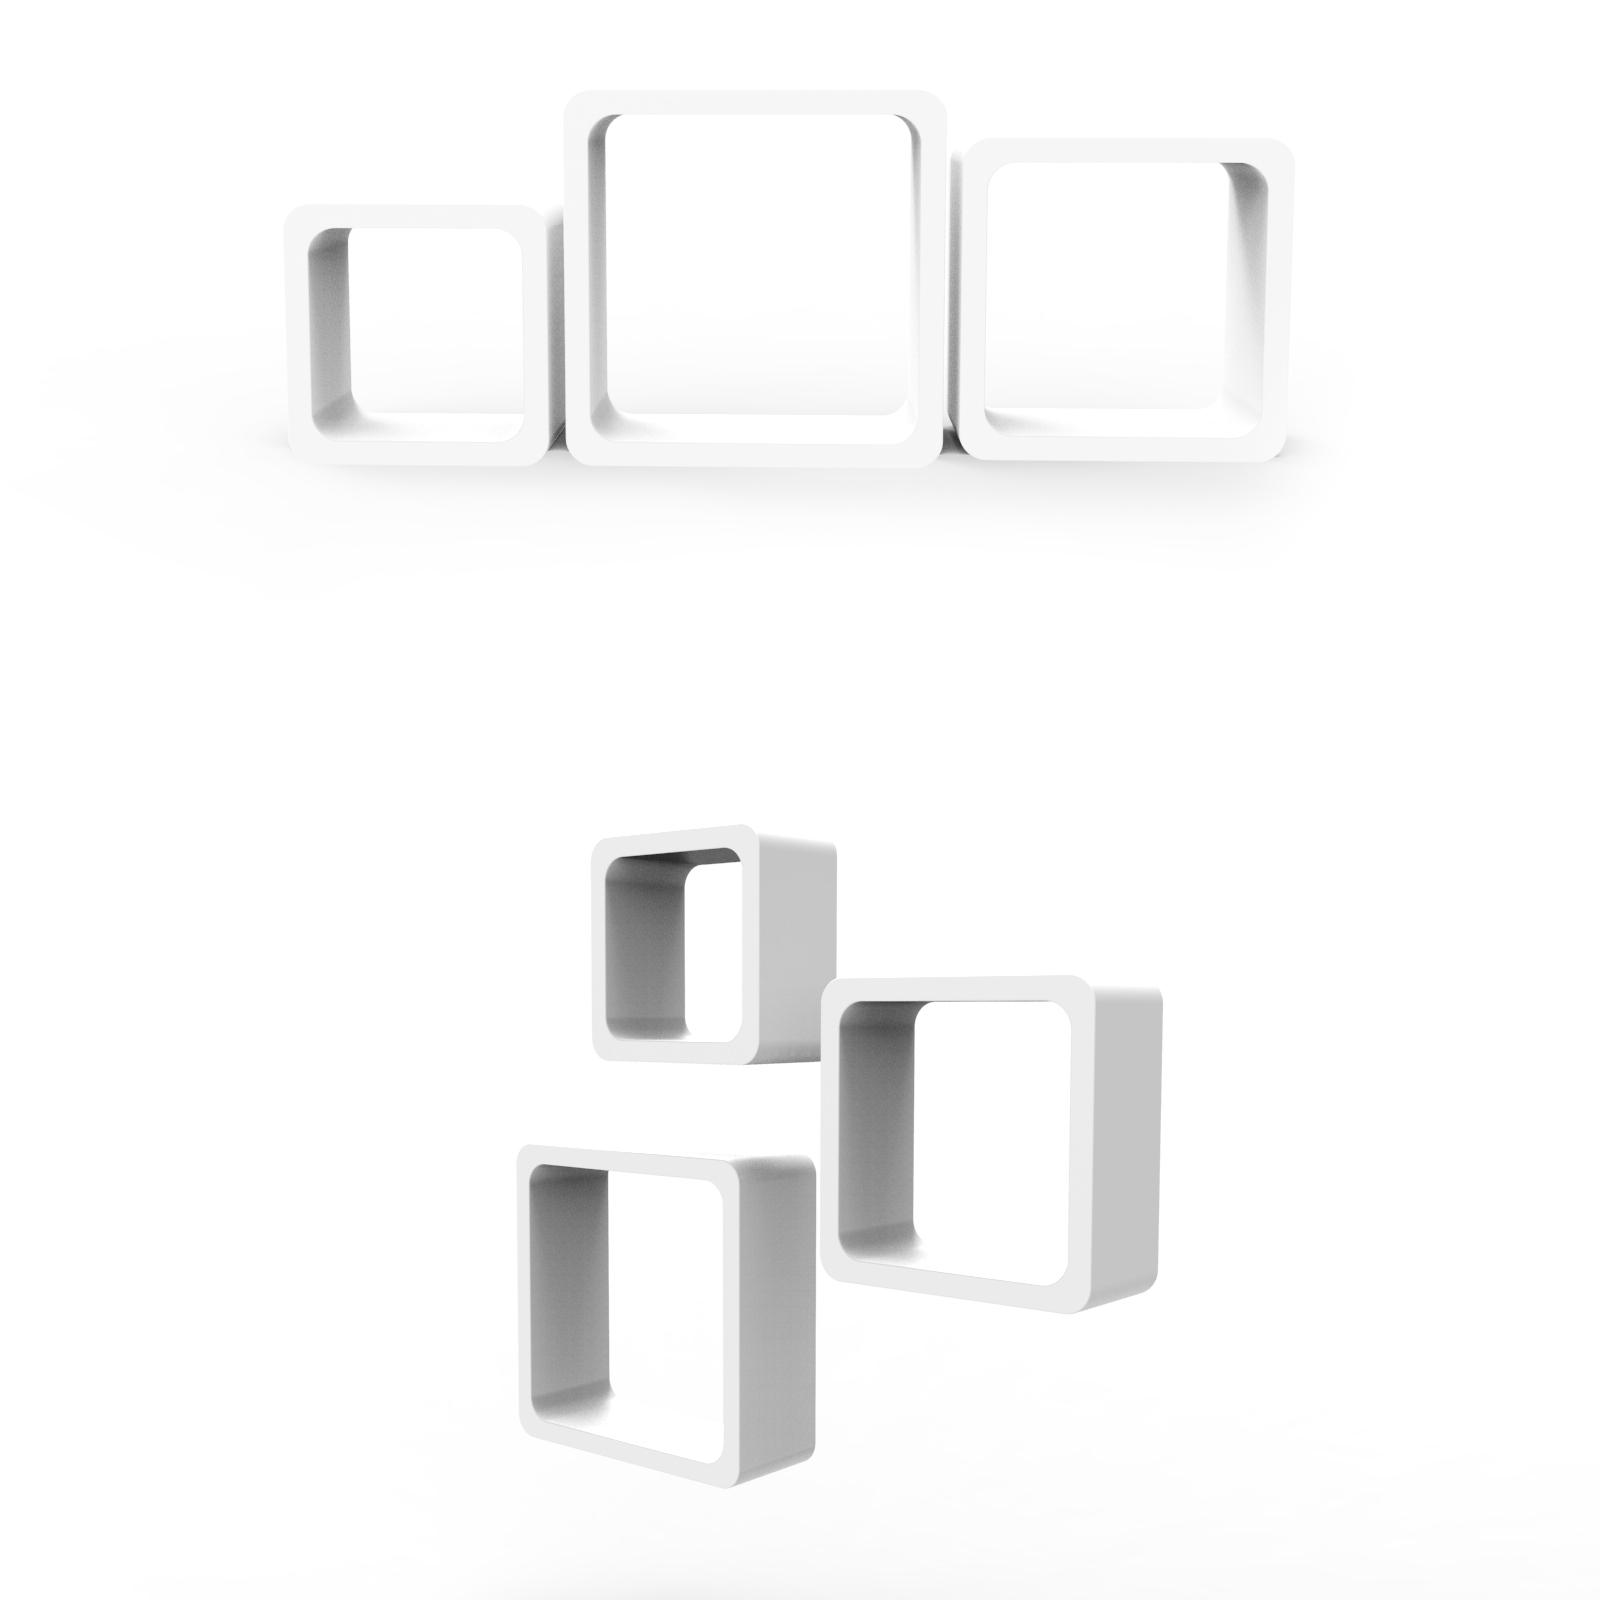 cube regal h ngeregal wandregal b cherregal hochglanz mdf regal wei c ware ebay. Black Bedroom Furniture Sets. Home Design Ideas